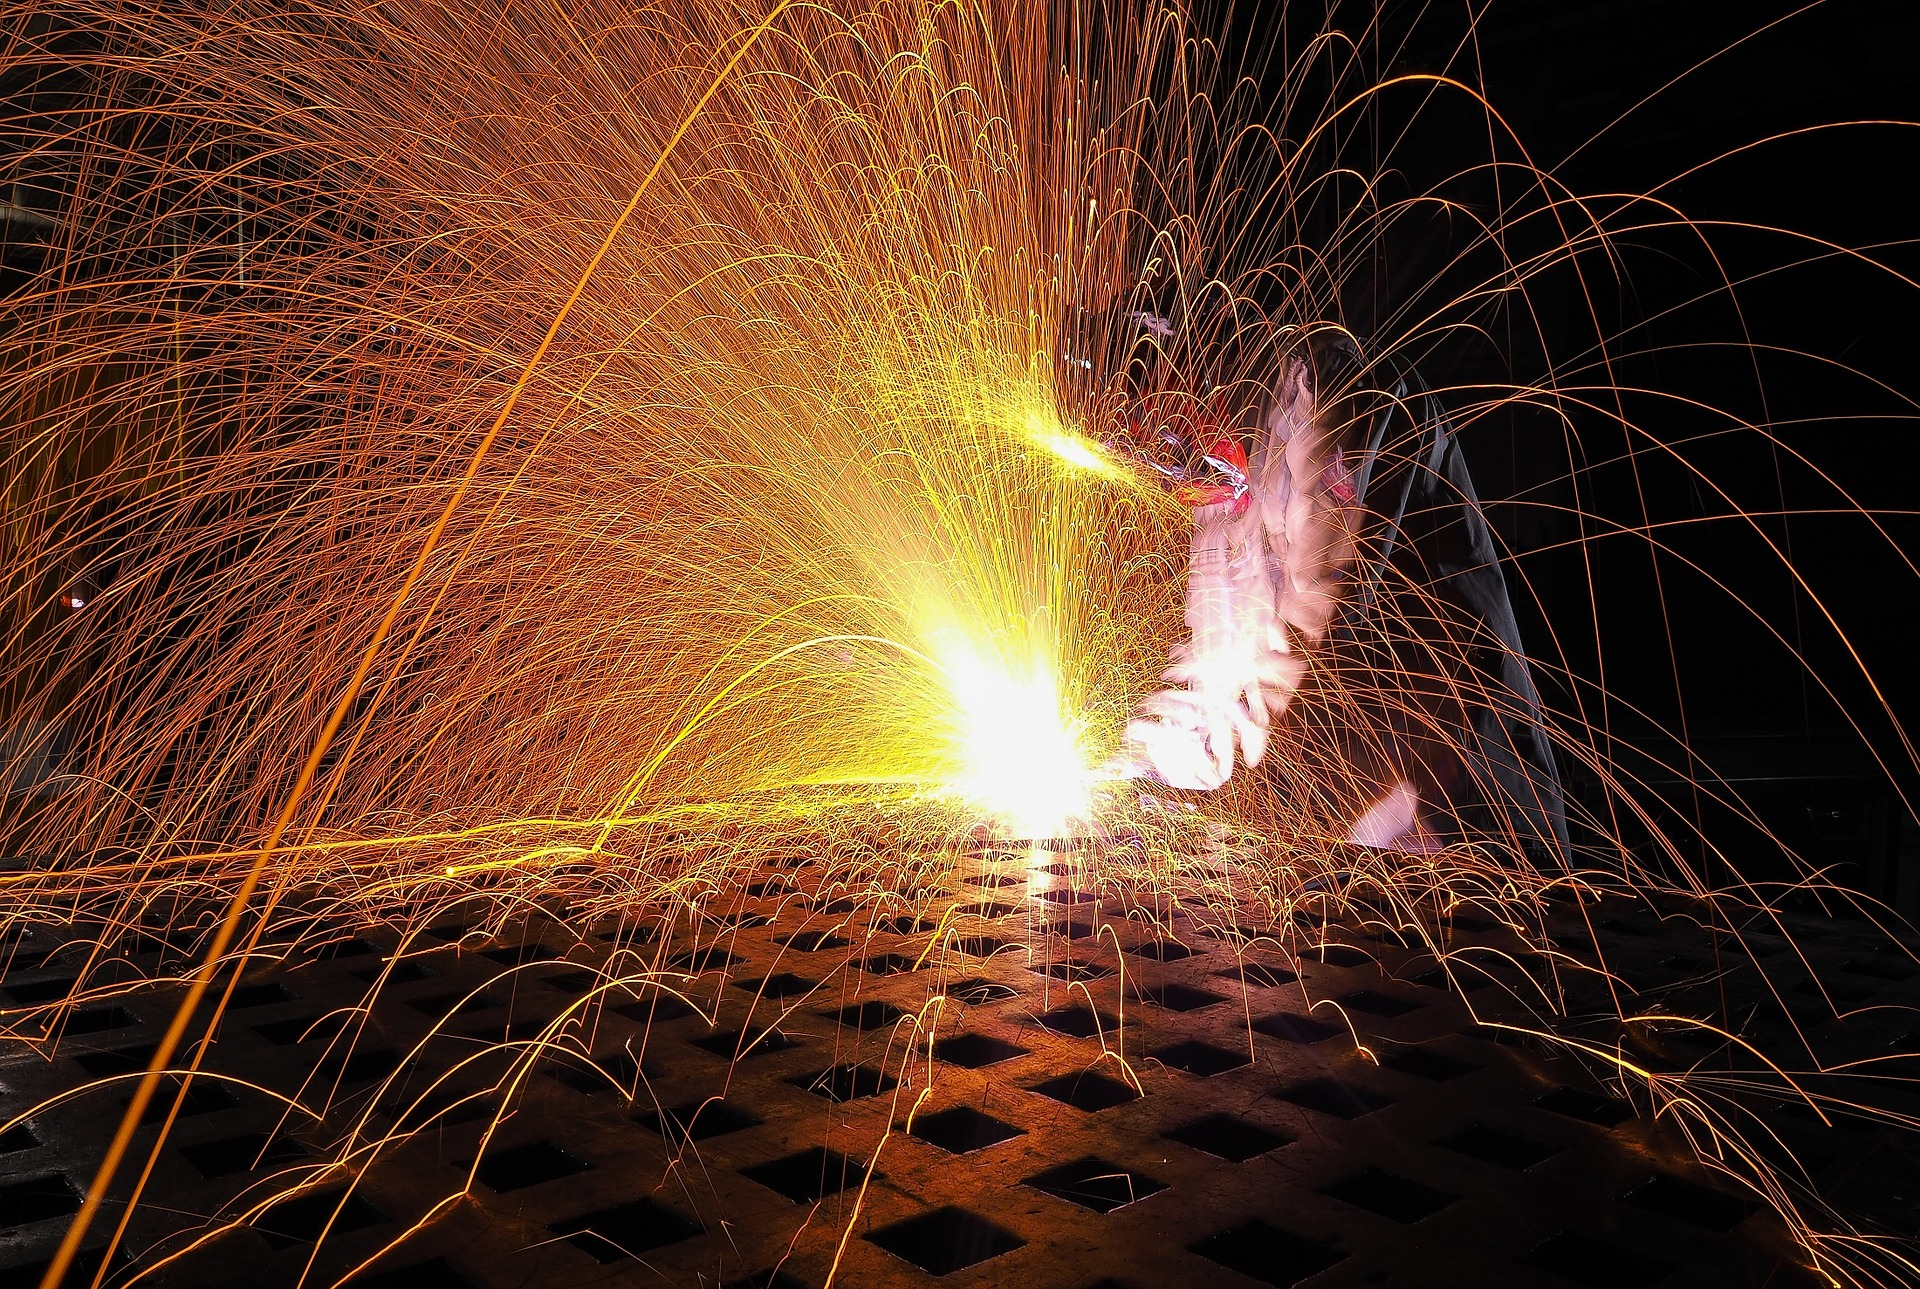 welding-2037926_1920.jpg